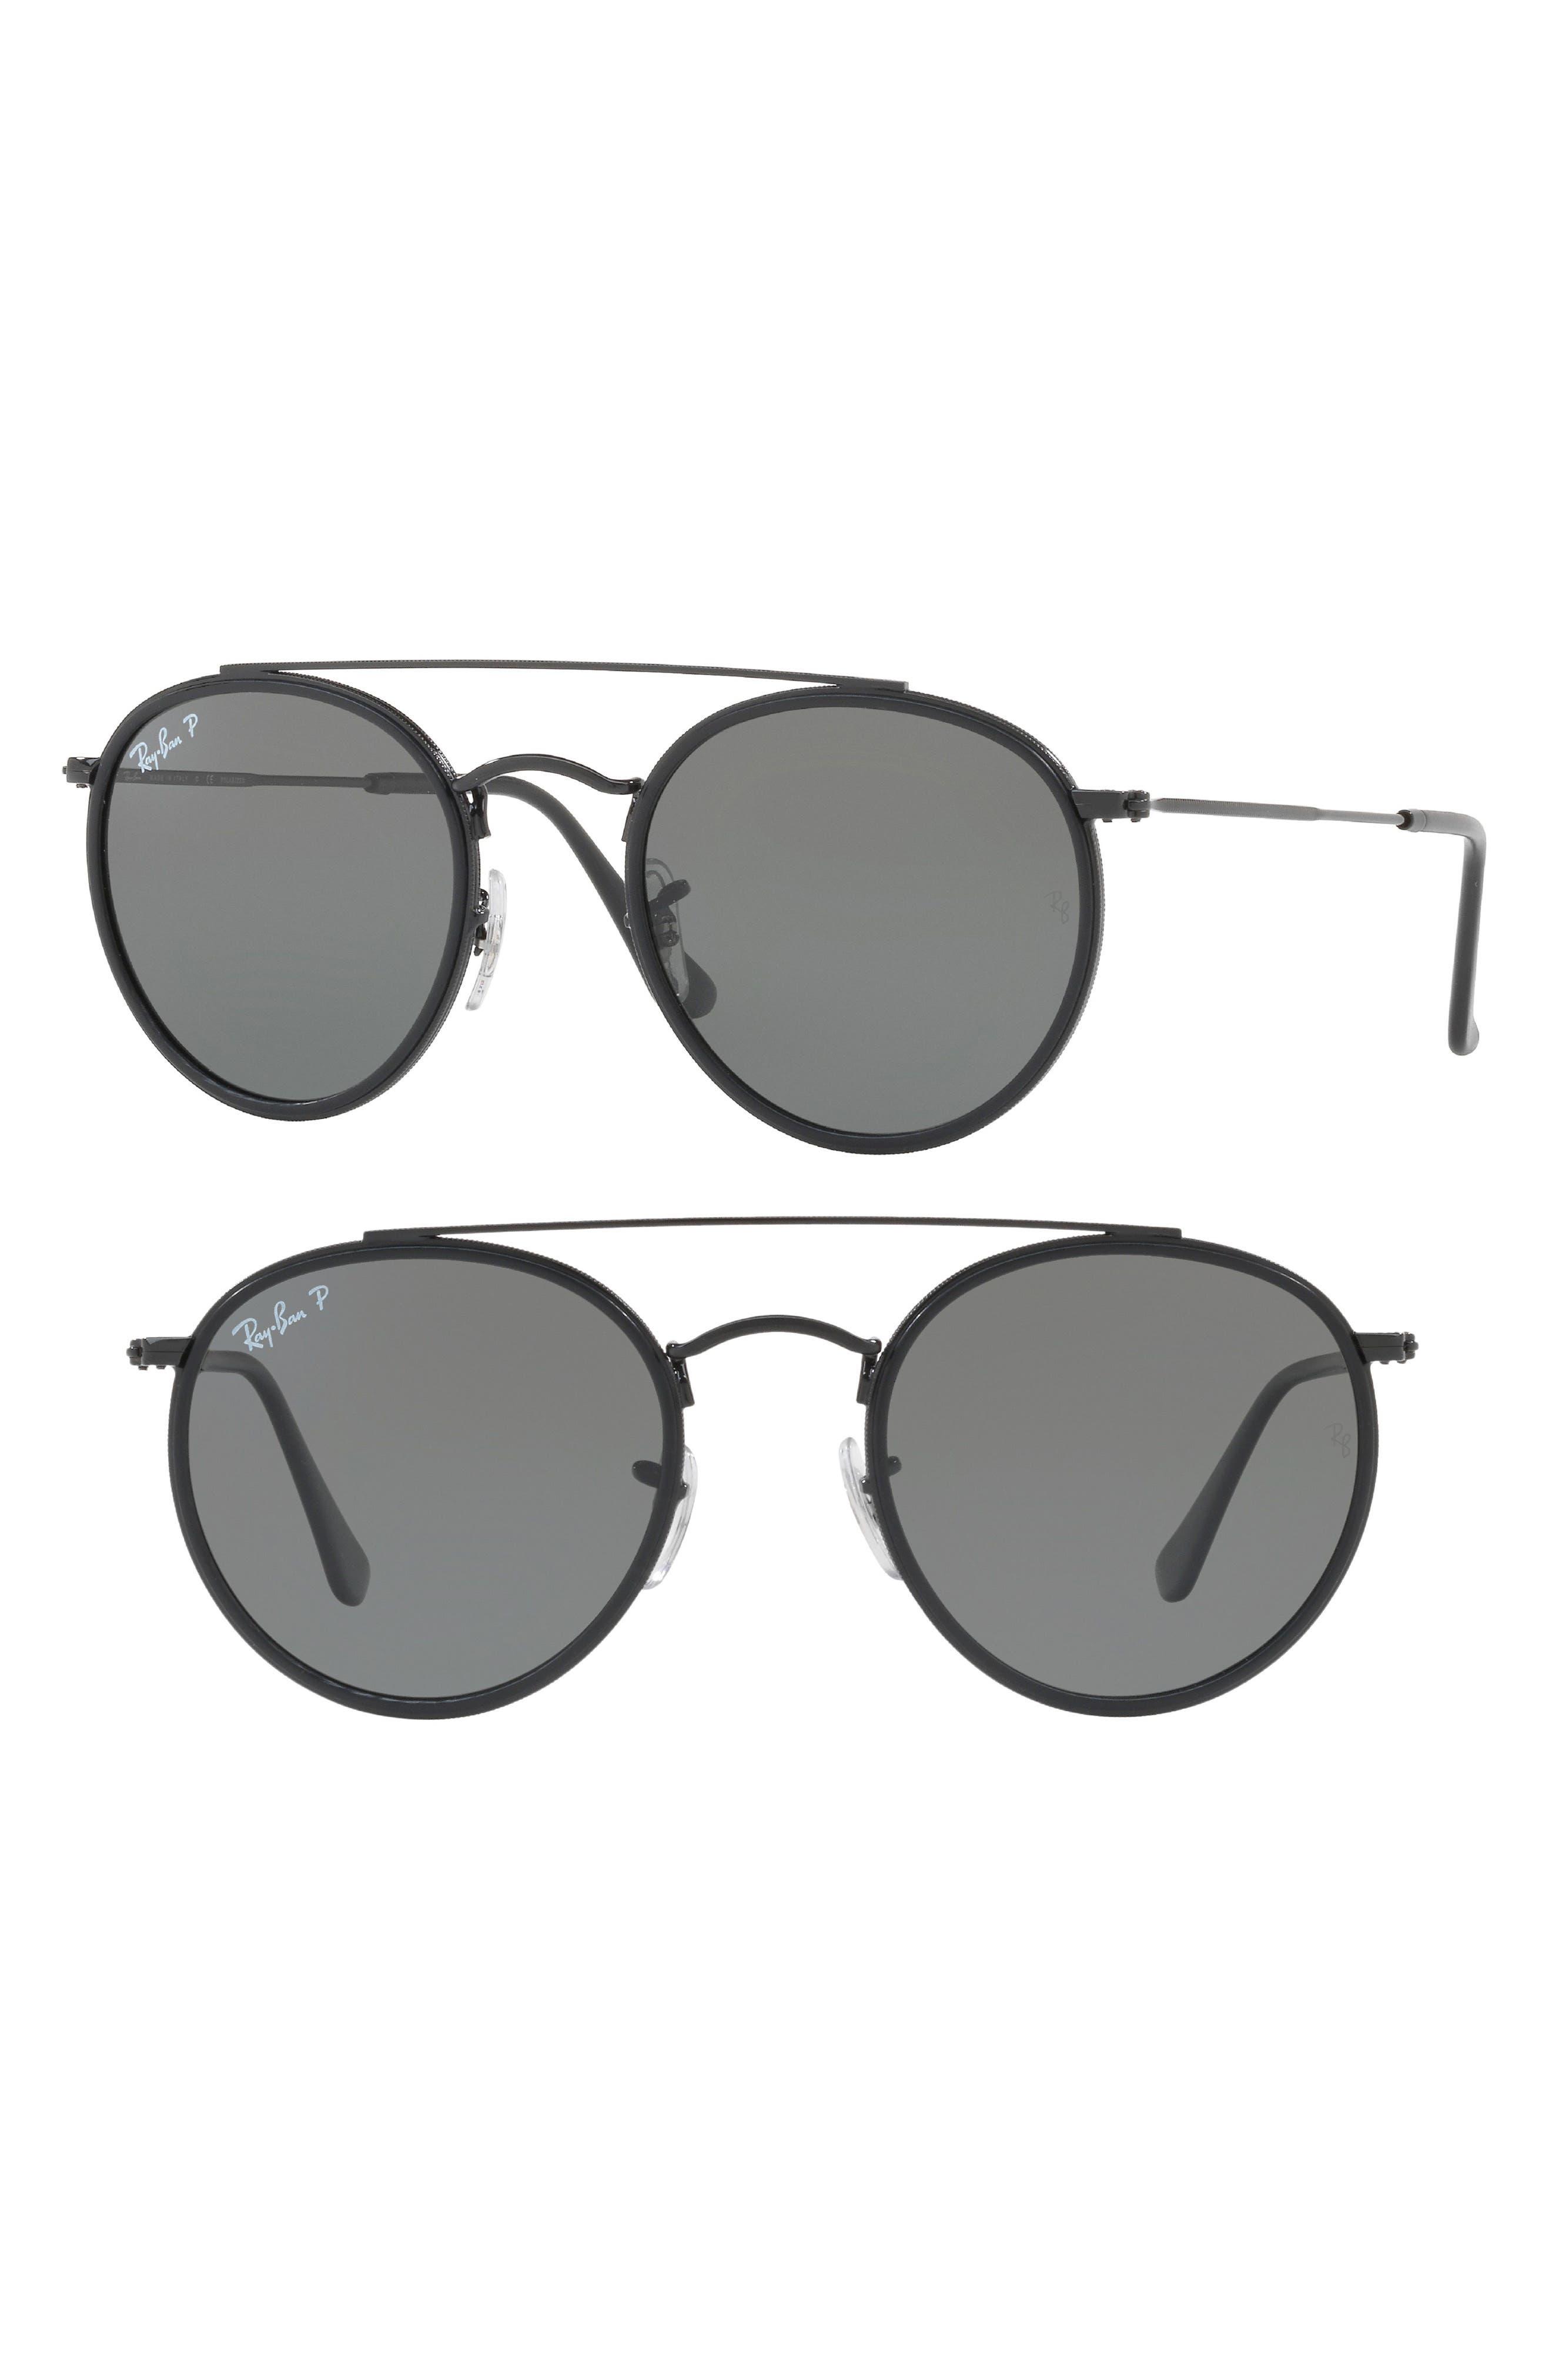 51mm Polarized Round Sunglasses,                             Main thumbnail 1, color,                             001